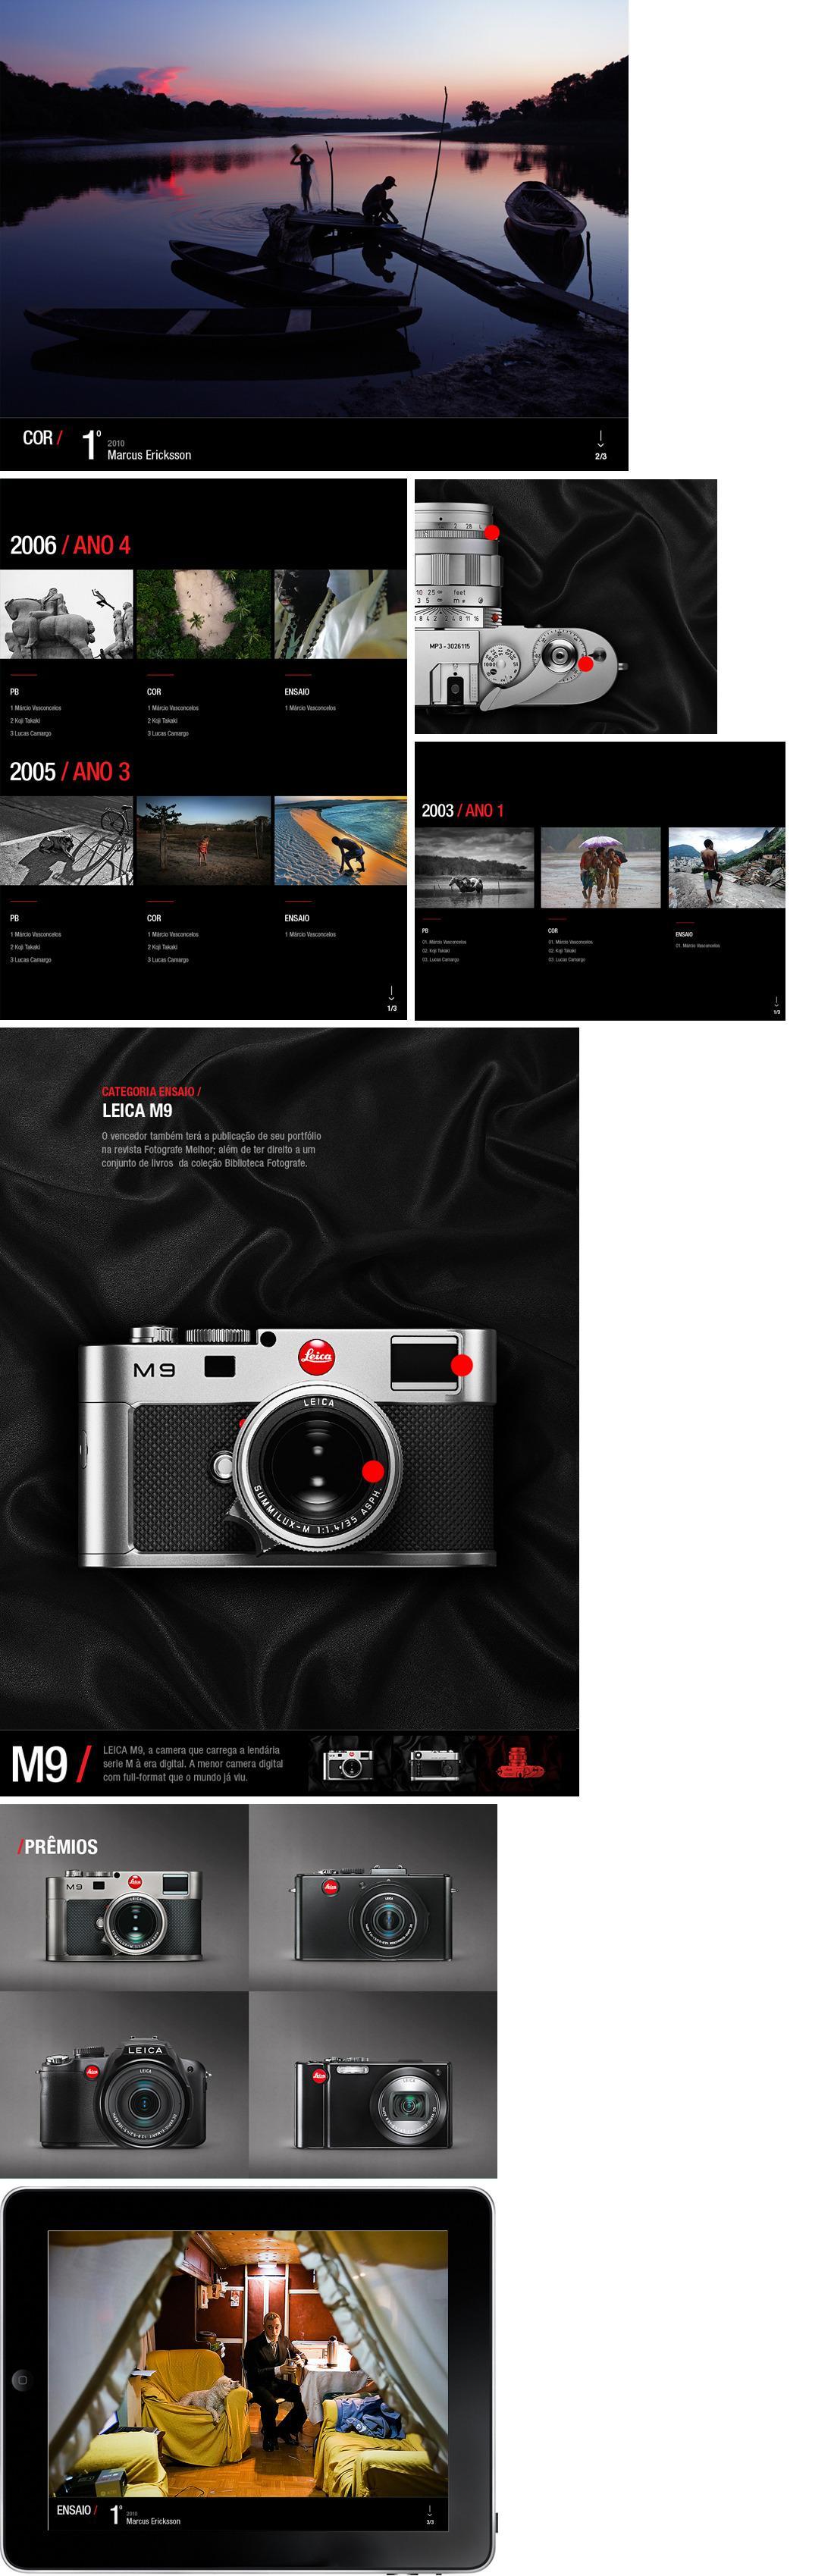 Ipad Leica - Pedro Burneiko